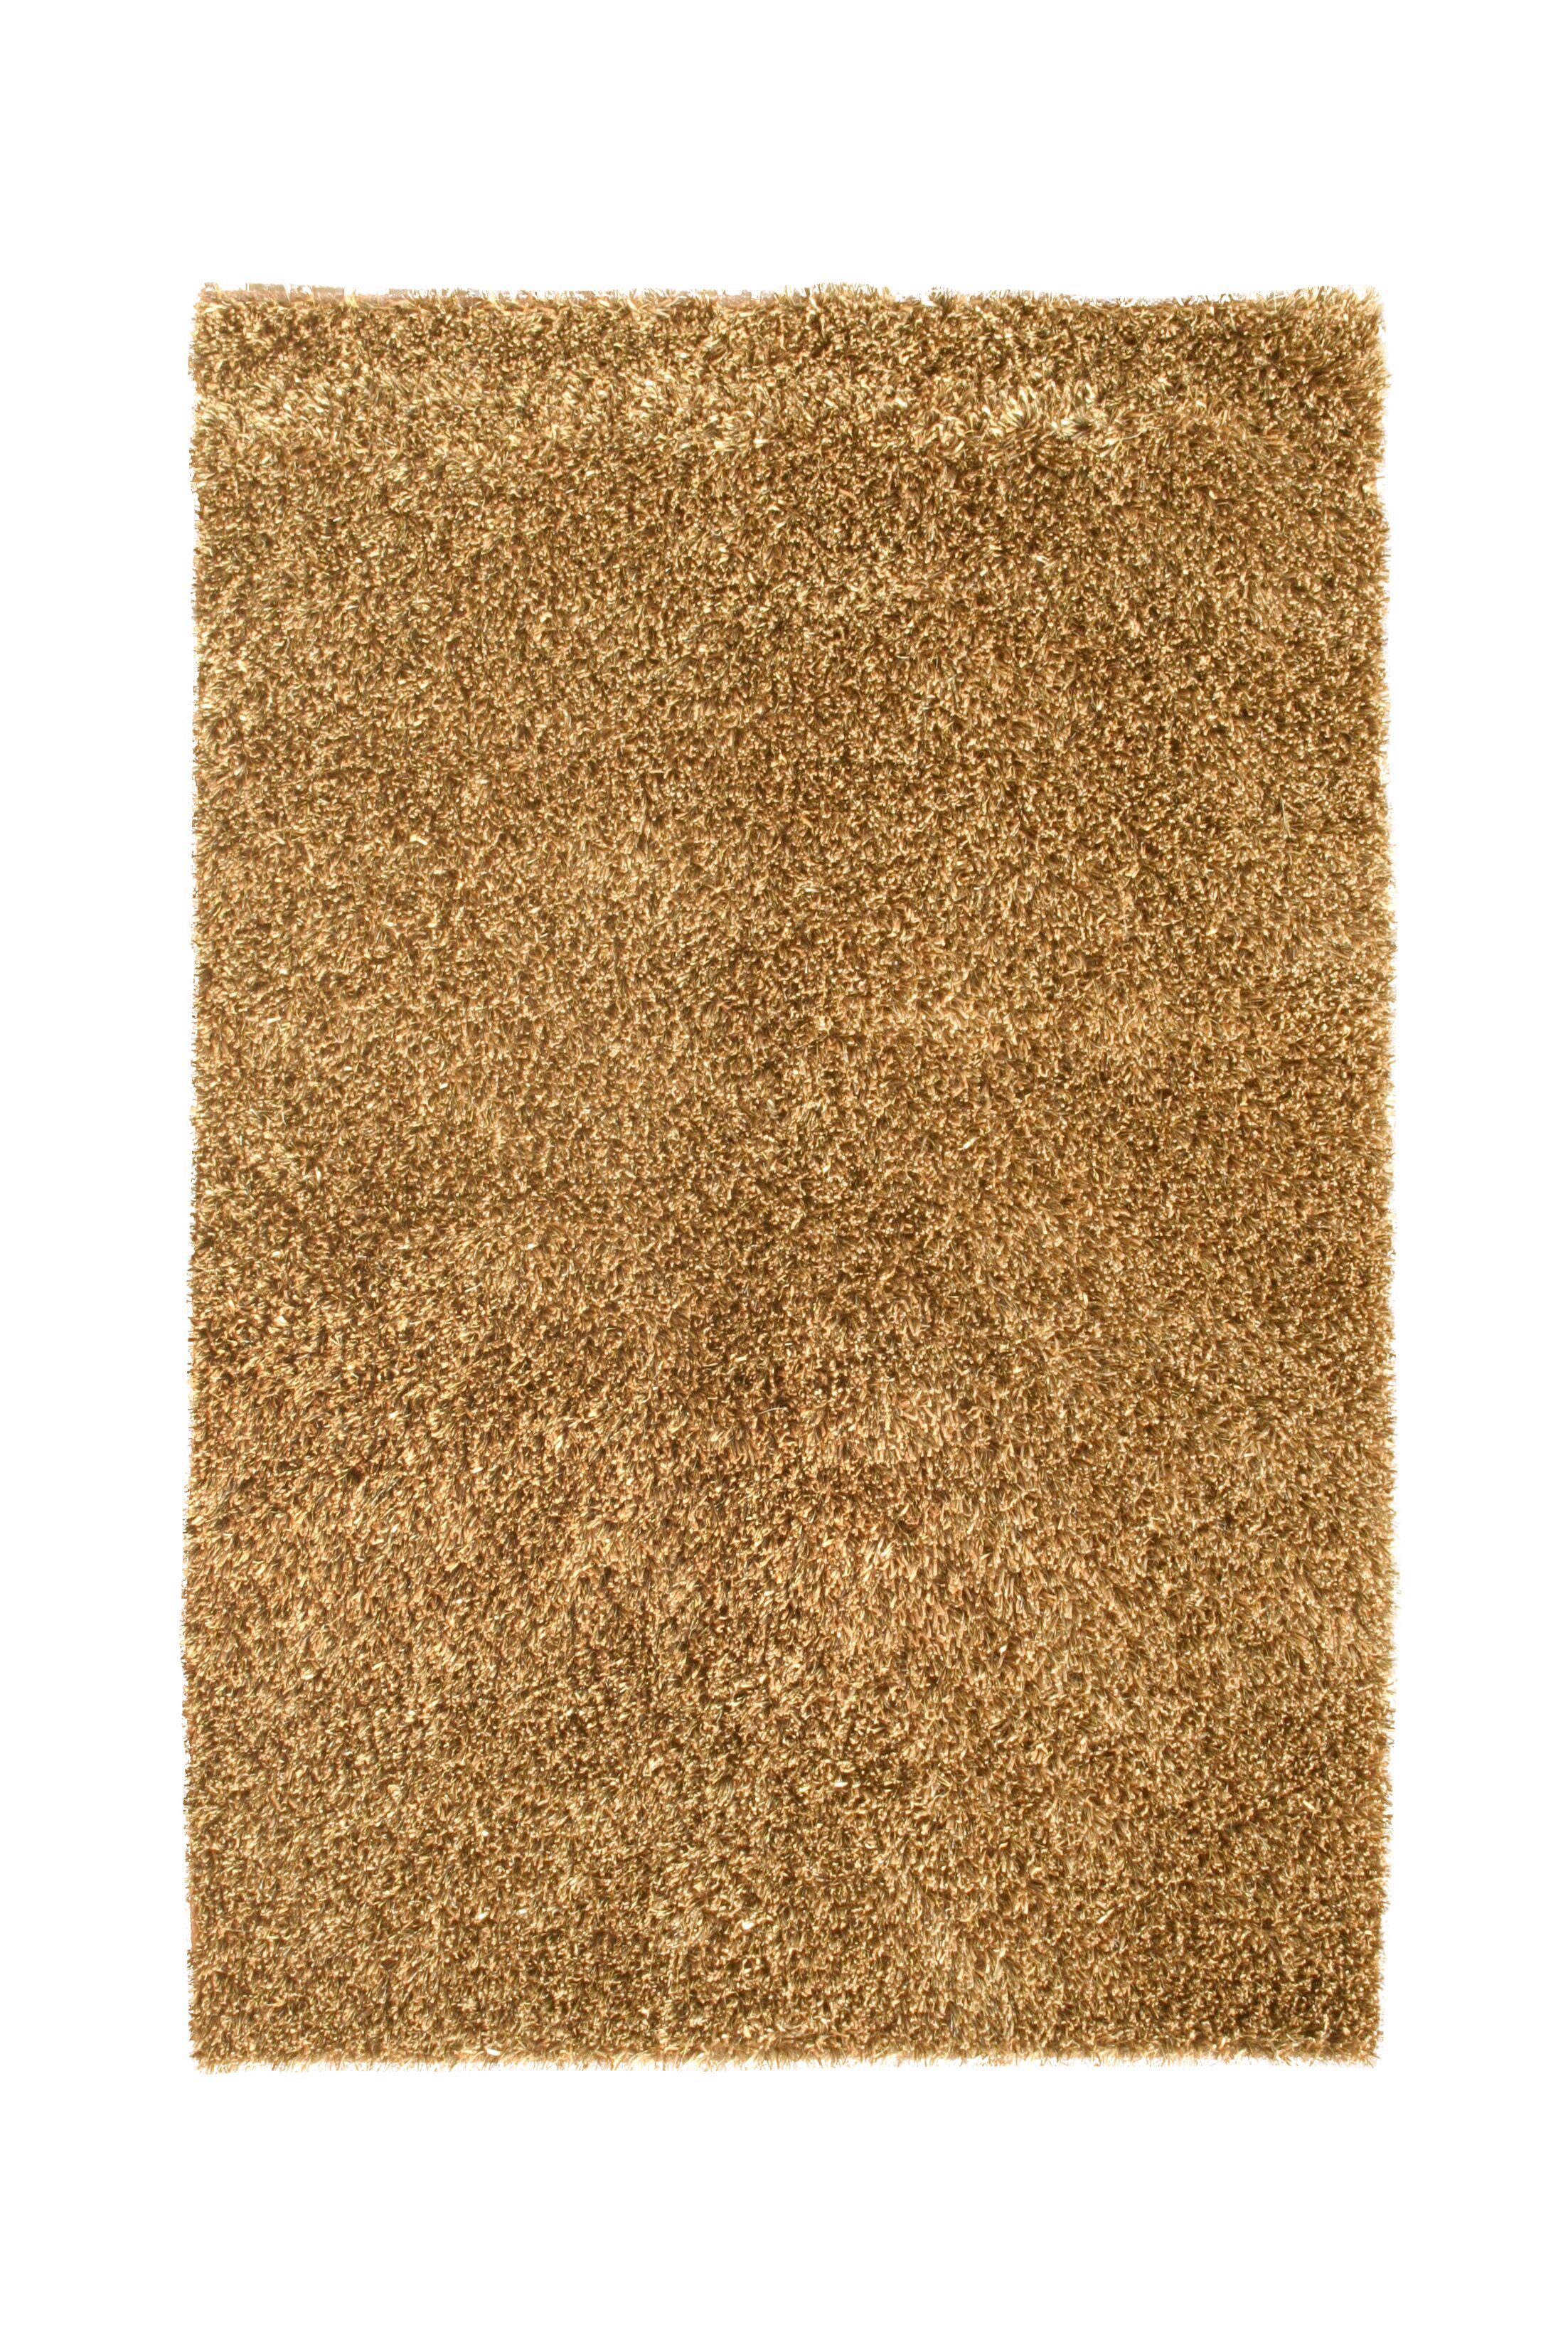 Sheen Brown Rug Rug Size: 8' x 11'